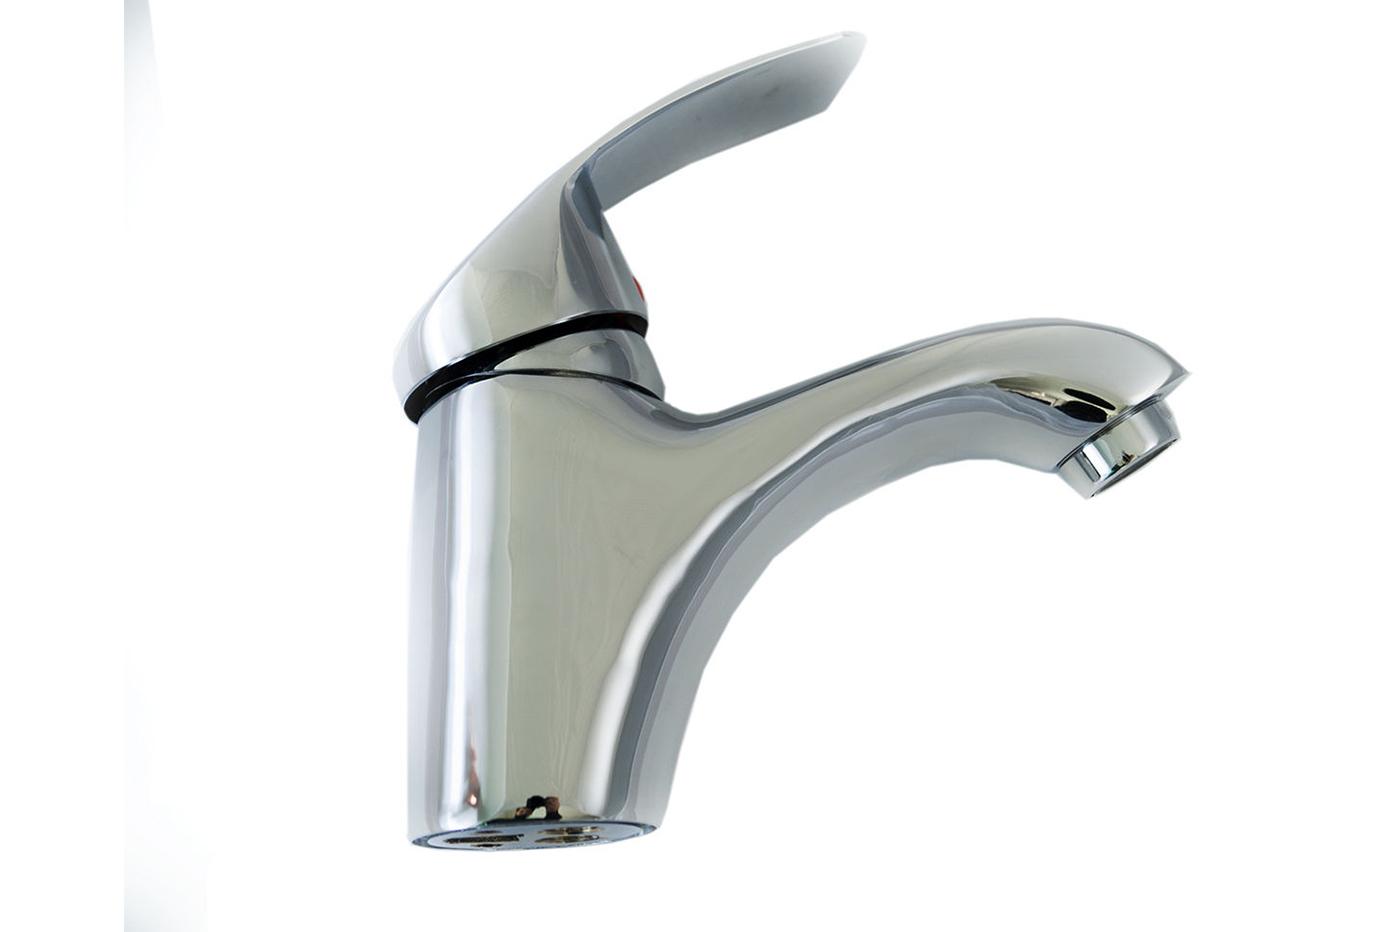 Bes rubinetteria beselettronica rubinetto miscelatore